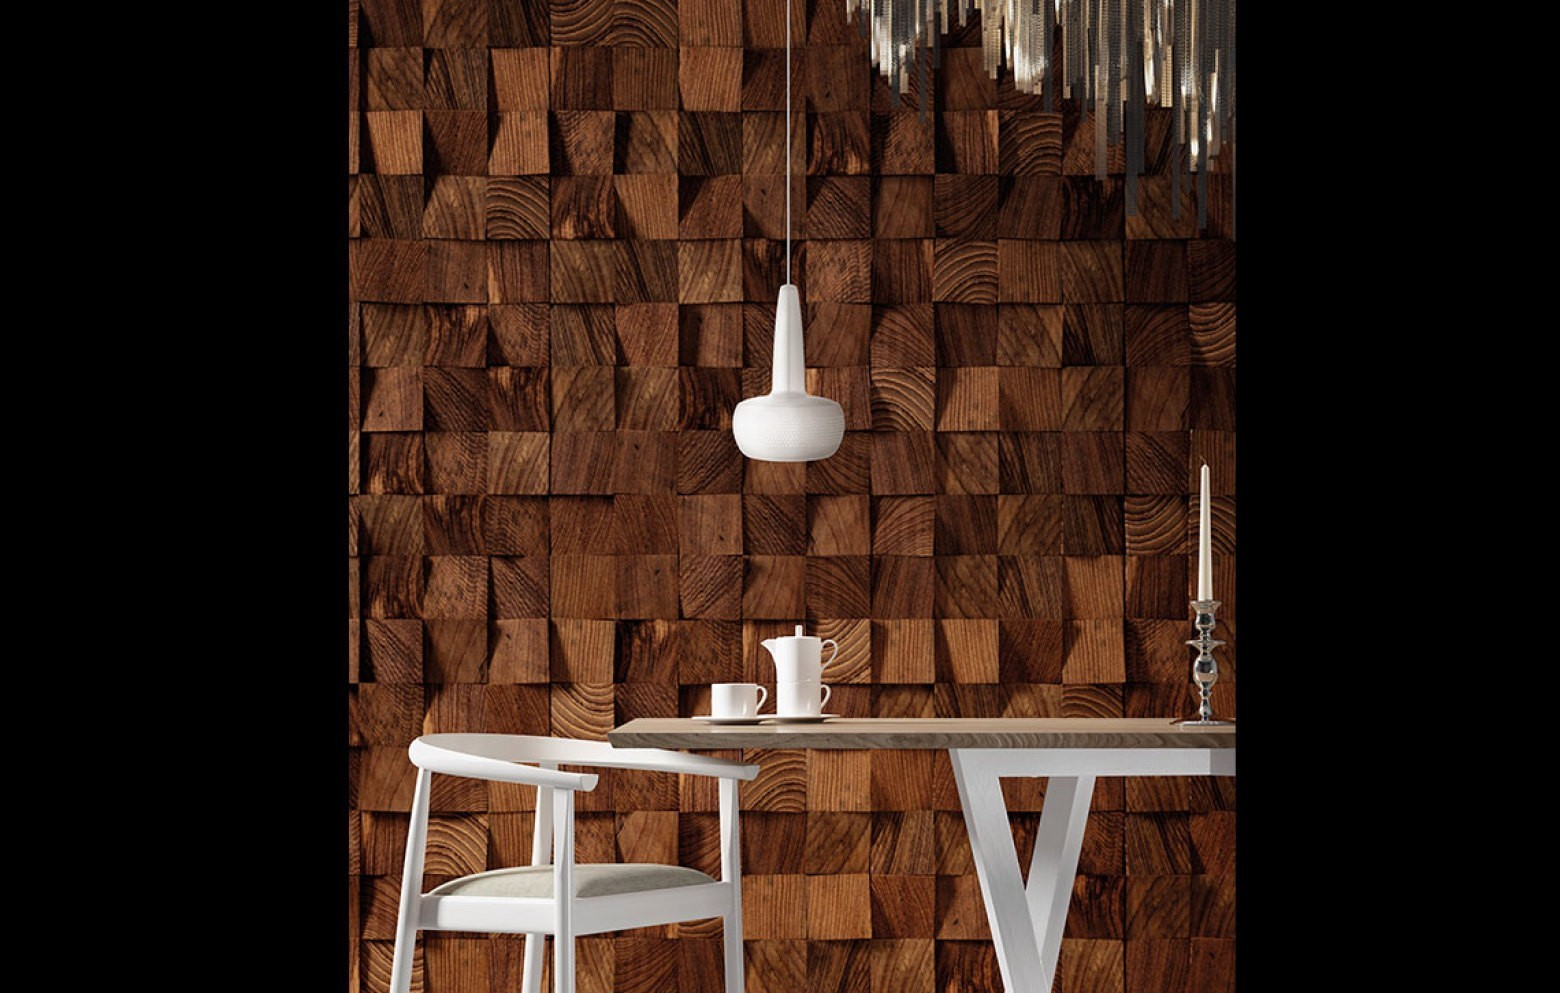 clava lampen kleinm bel accessoires who 39 s perfect. Black Bedroom Furniture Sets. Home Design Ideas